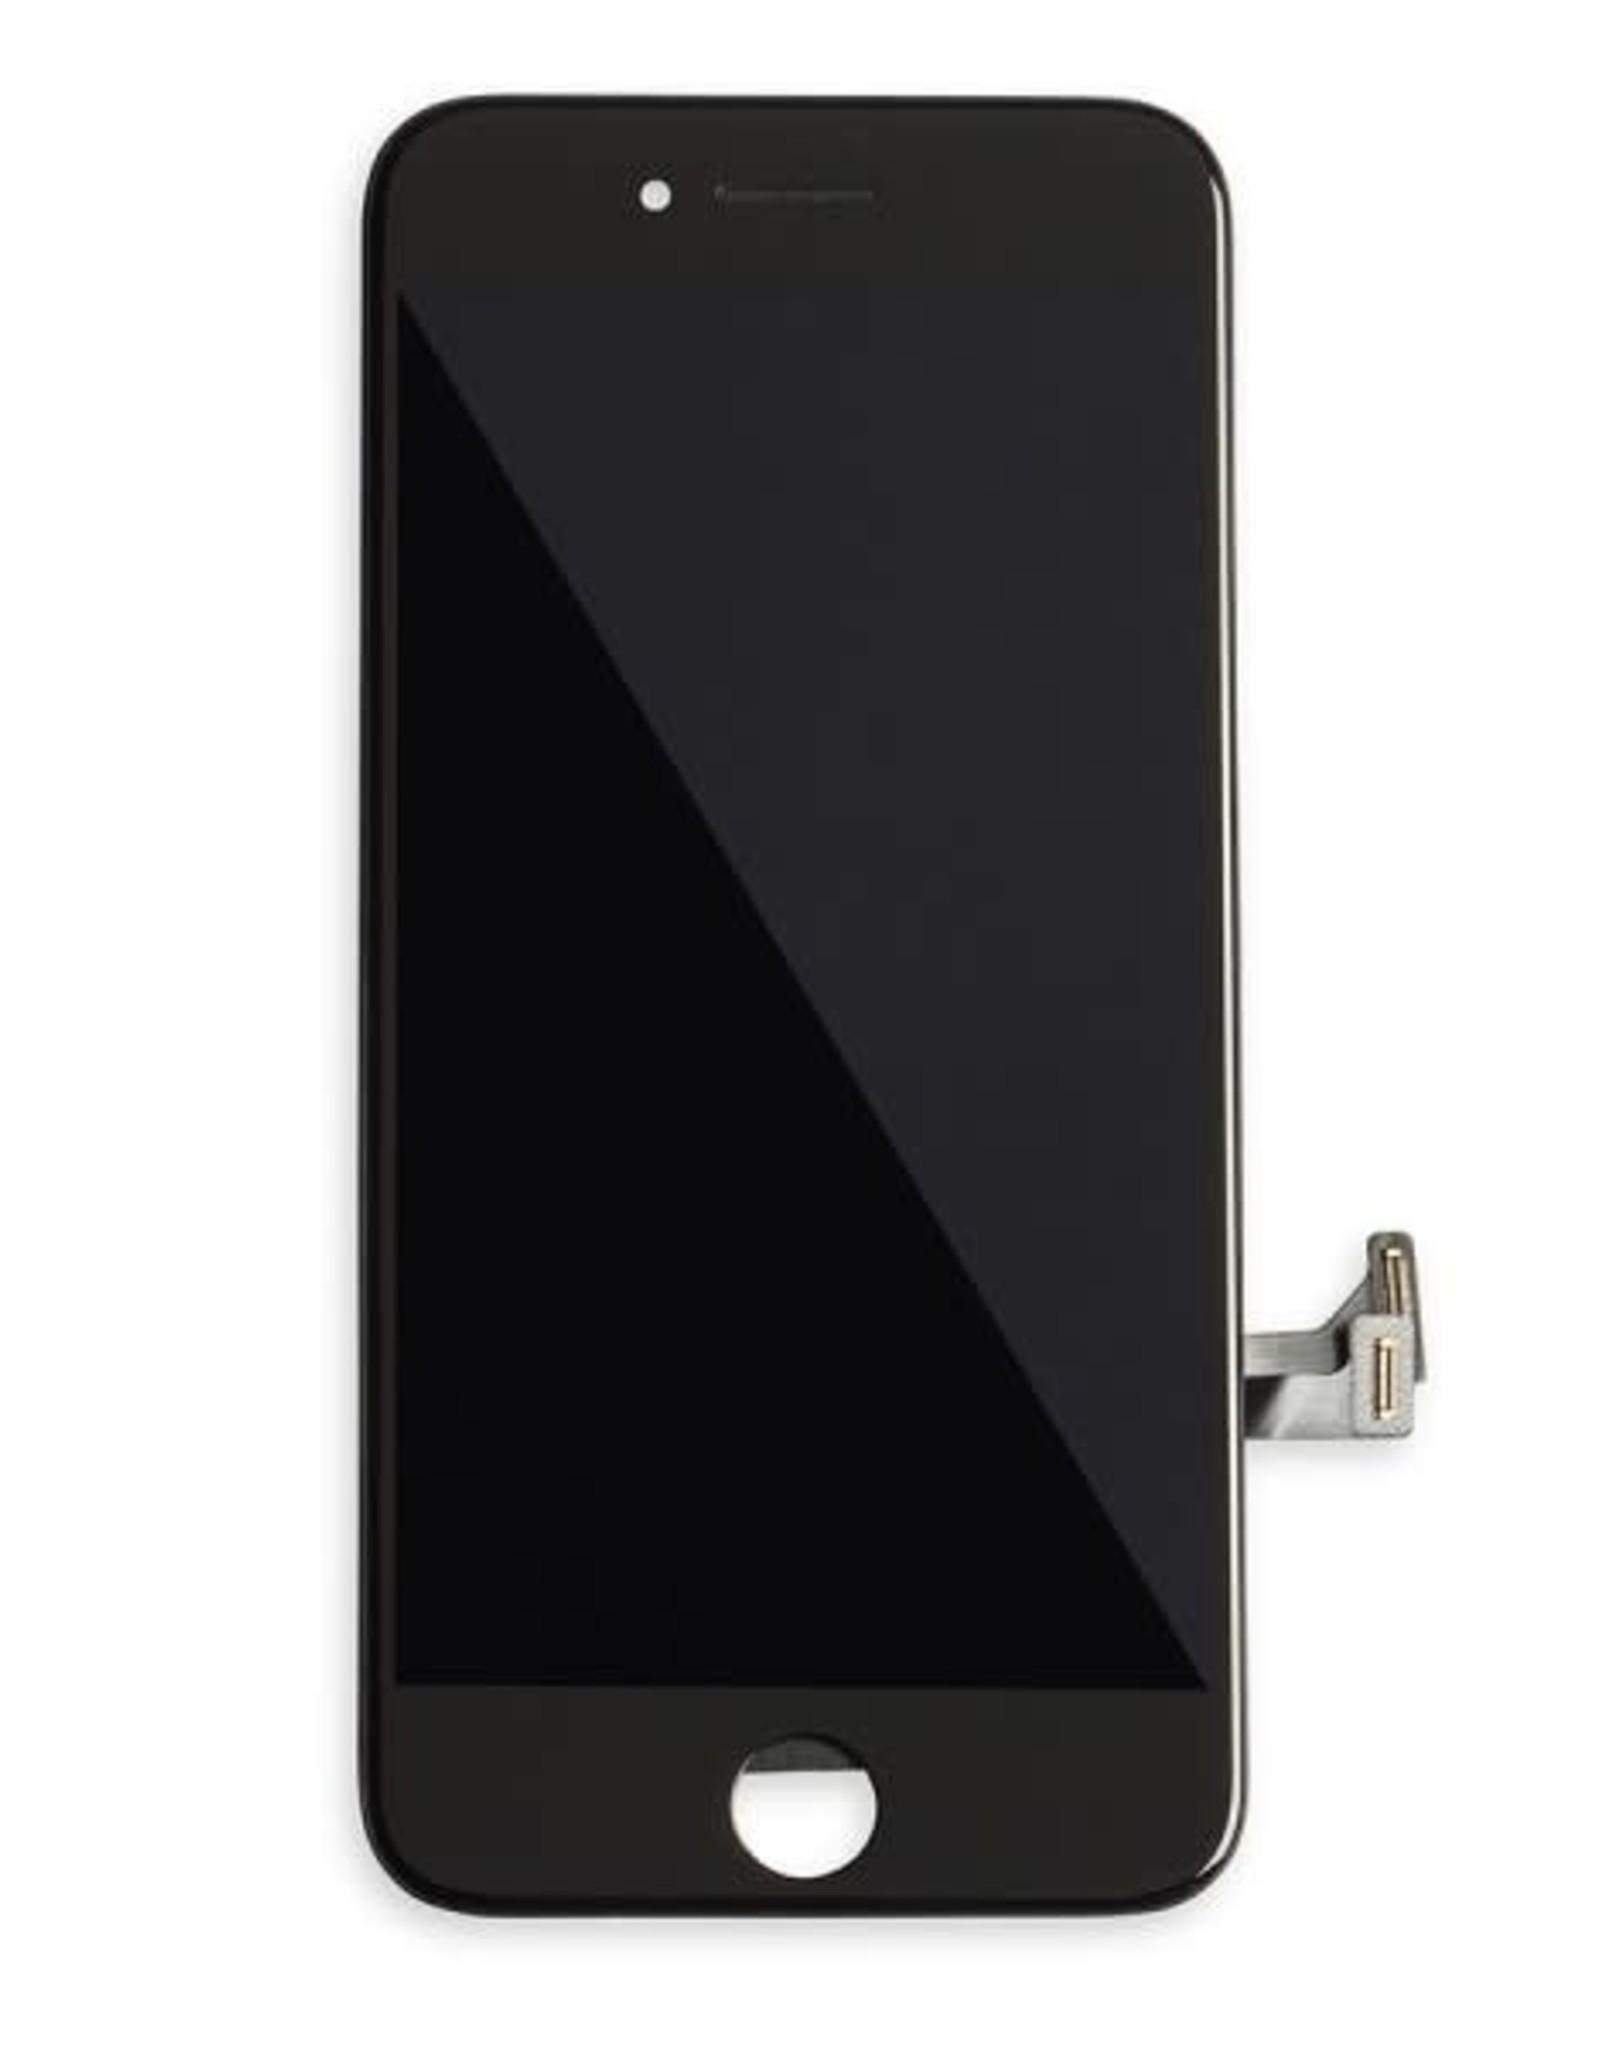 Apple iPhone 7 (Black) LCD Screen Replacement OEM